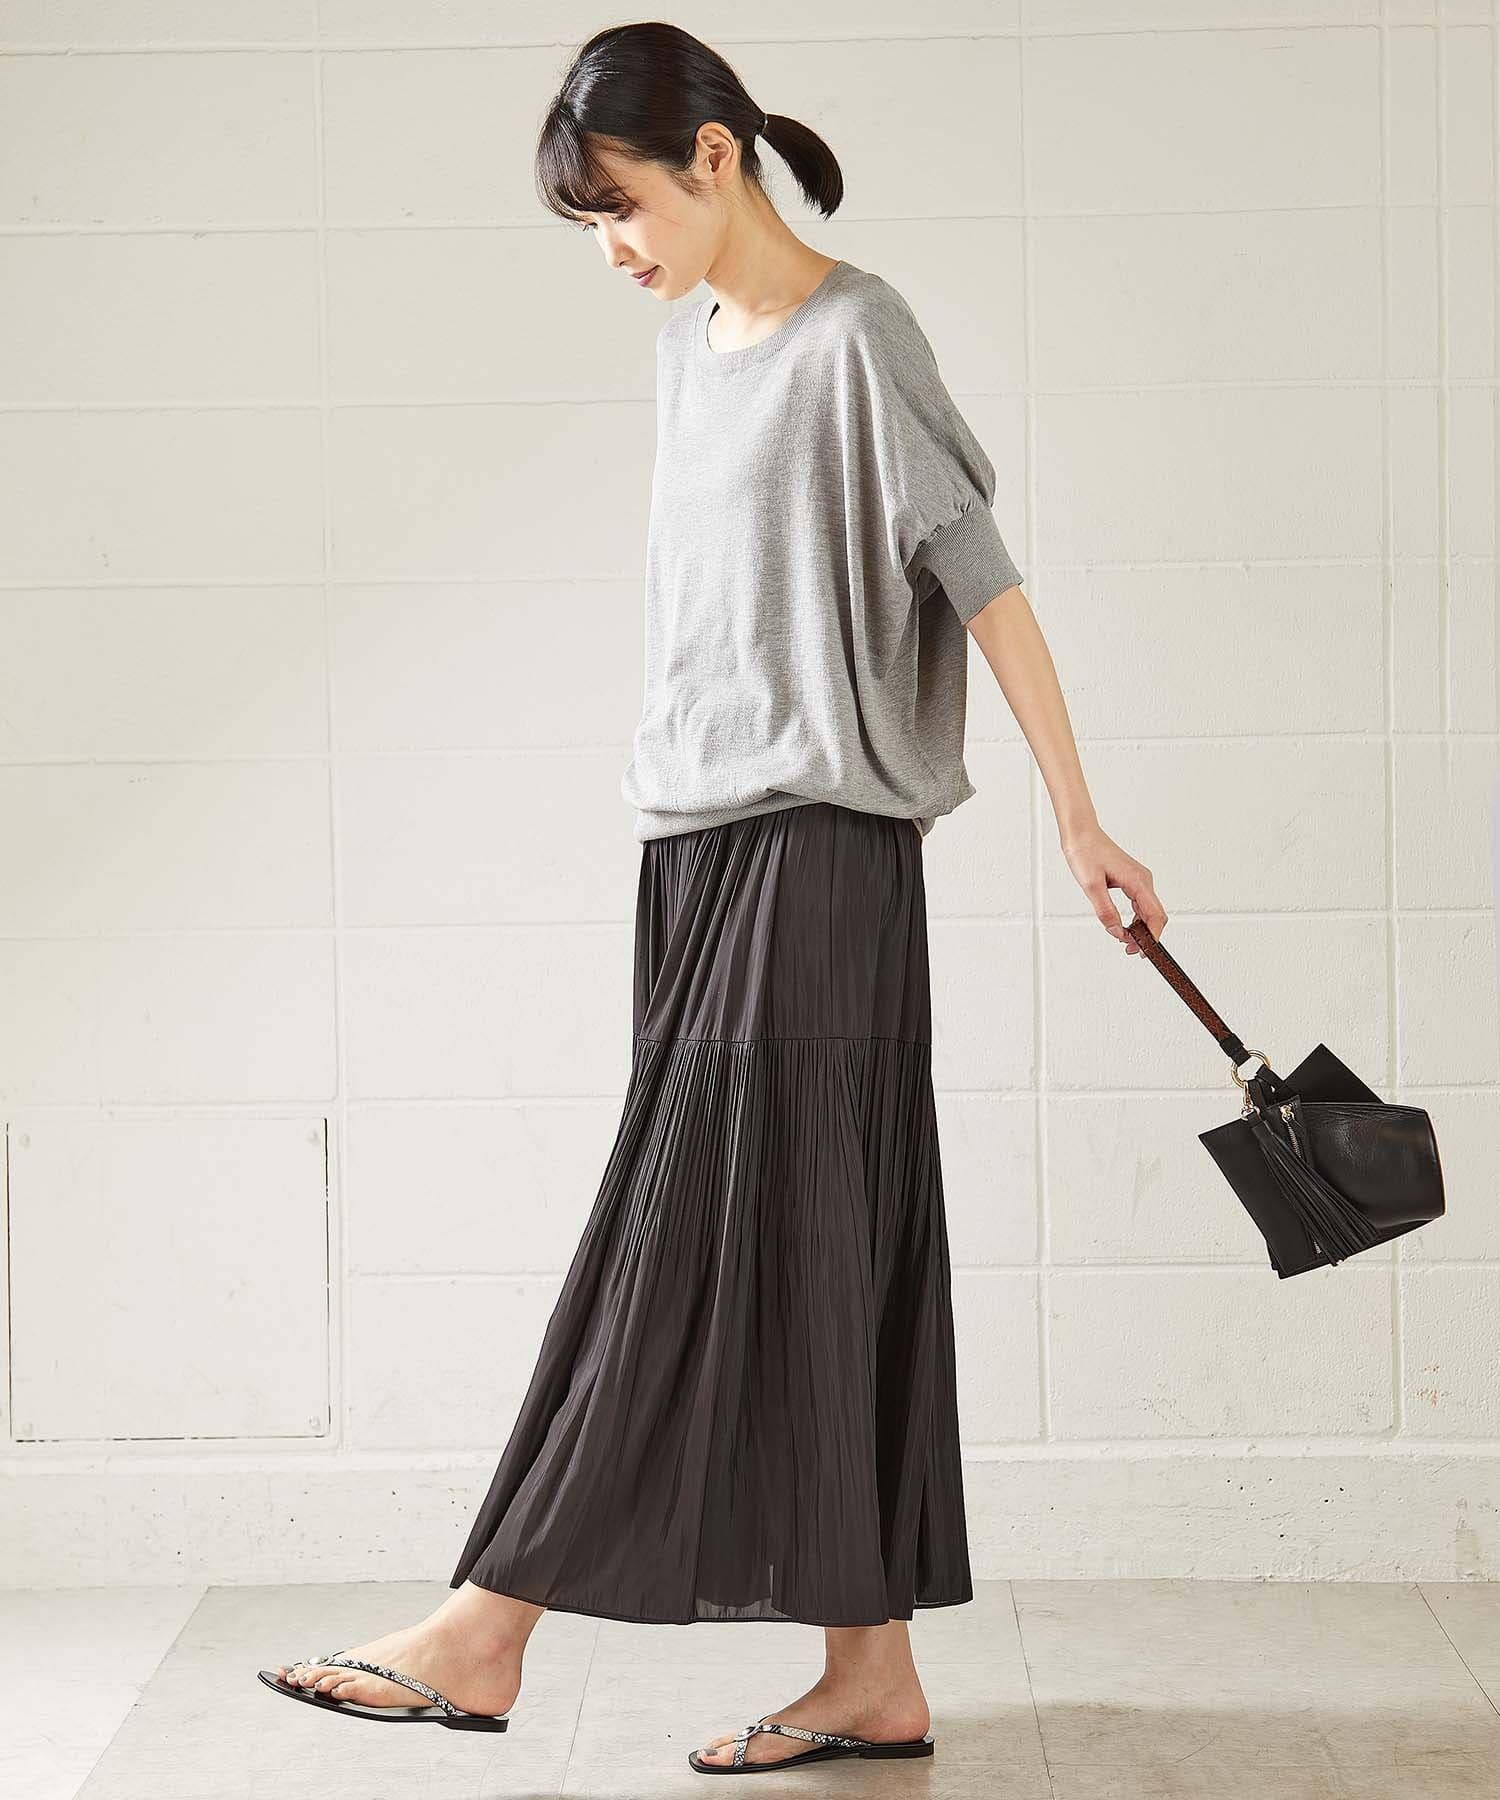 OUVRAGE CLASSE(ウヴラージュクラス) 2段プリーツギャザースカート【オンラインストア限定販売】